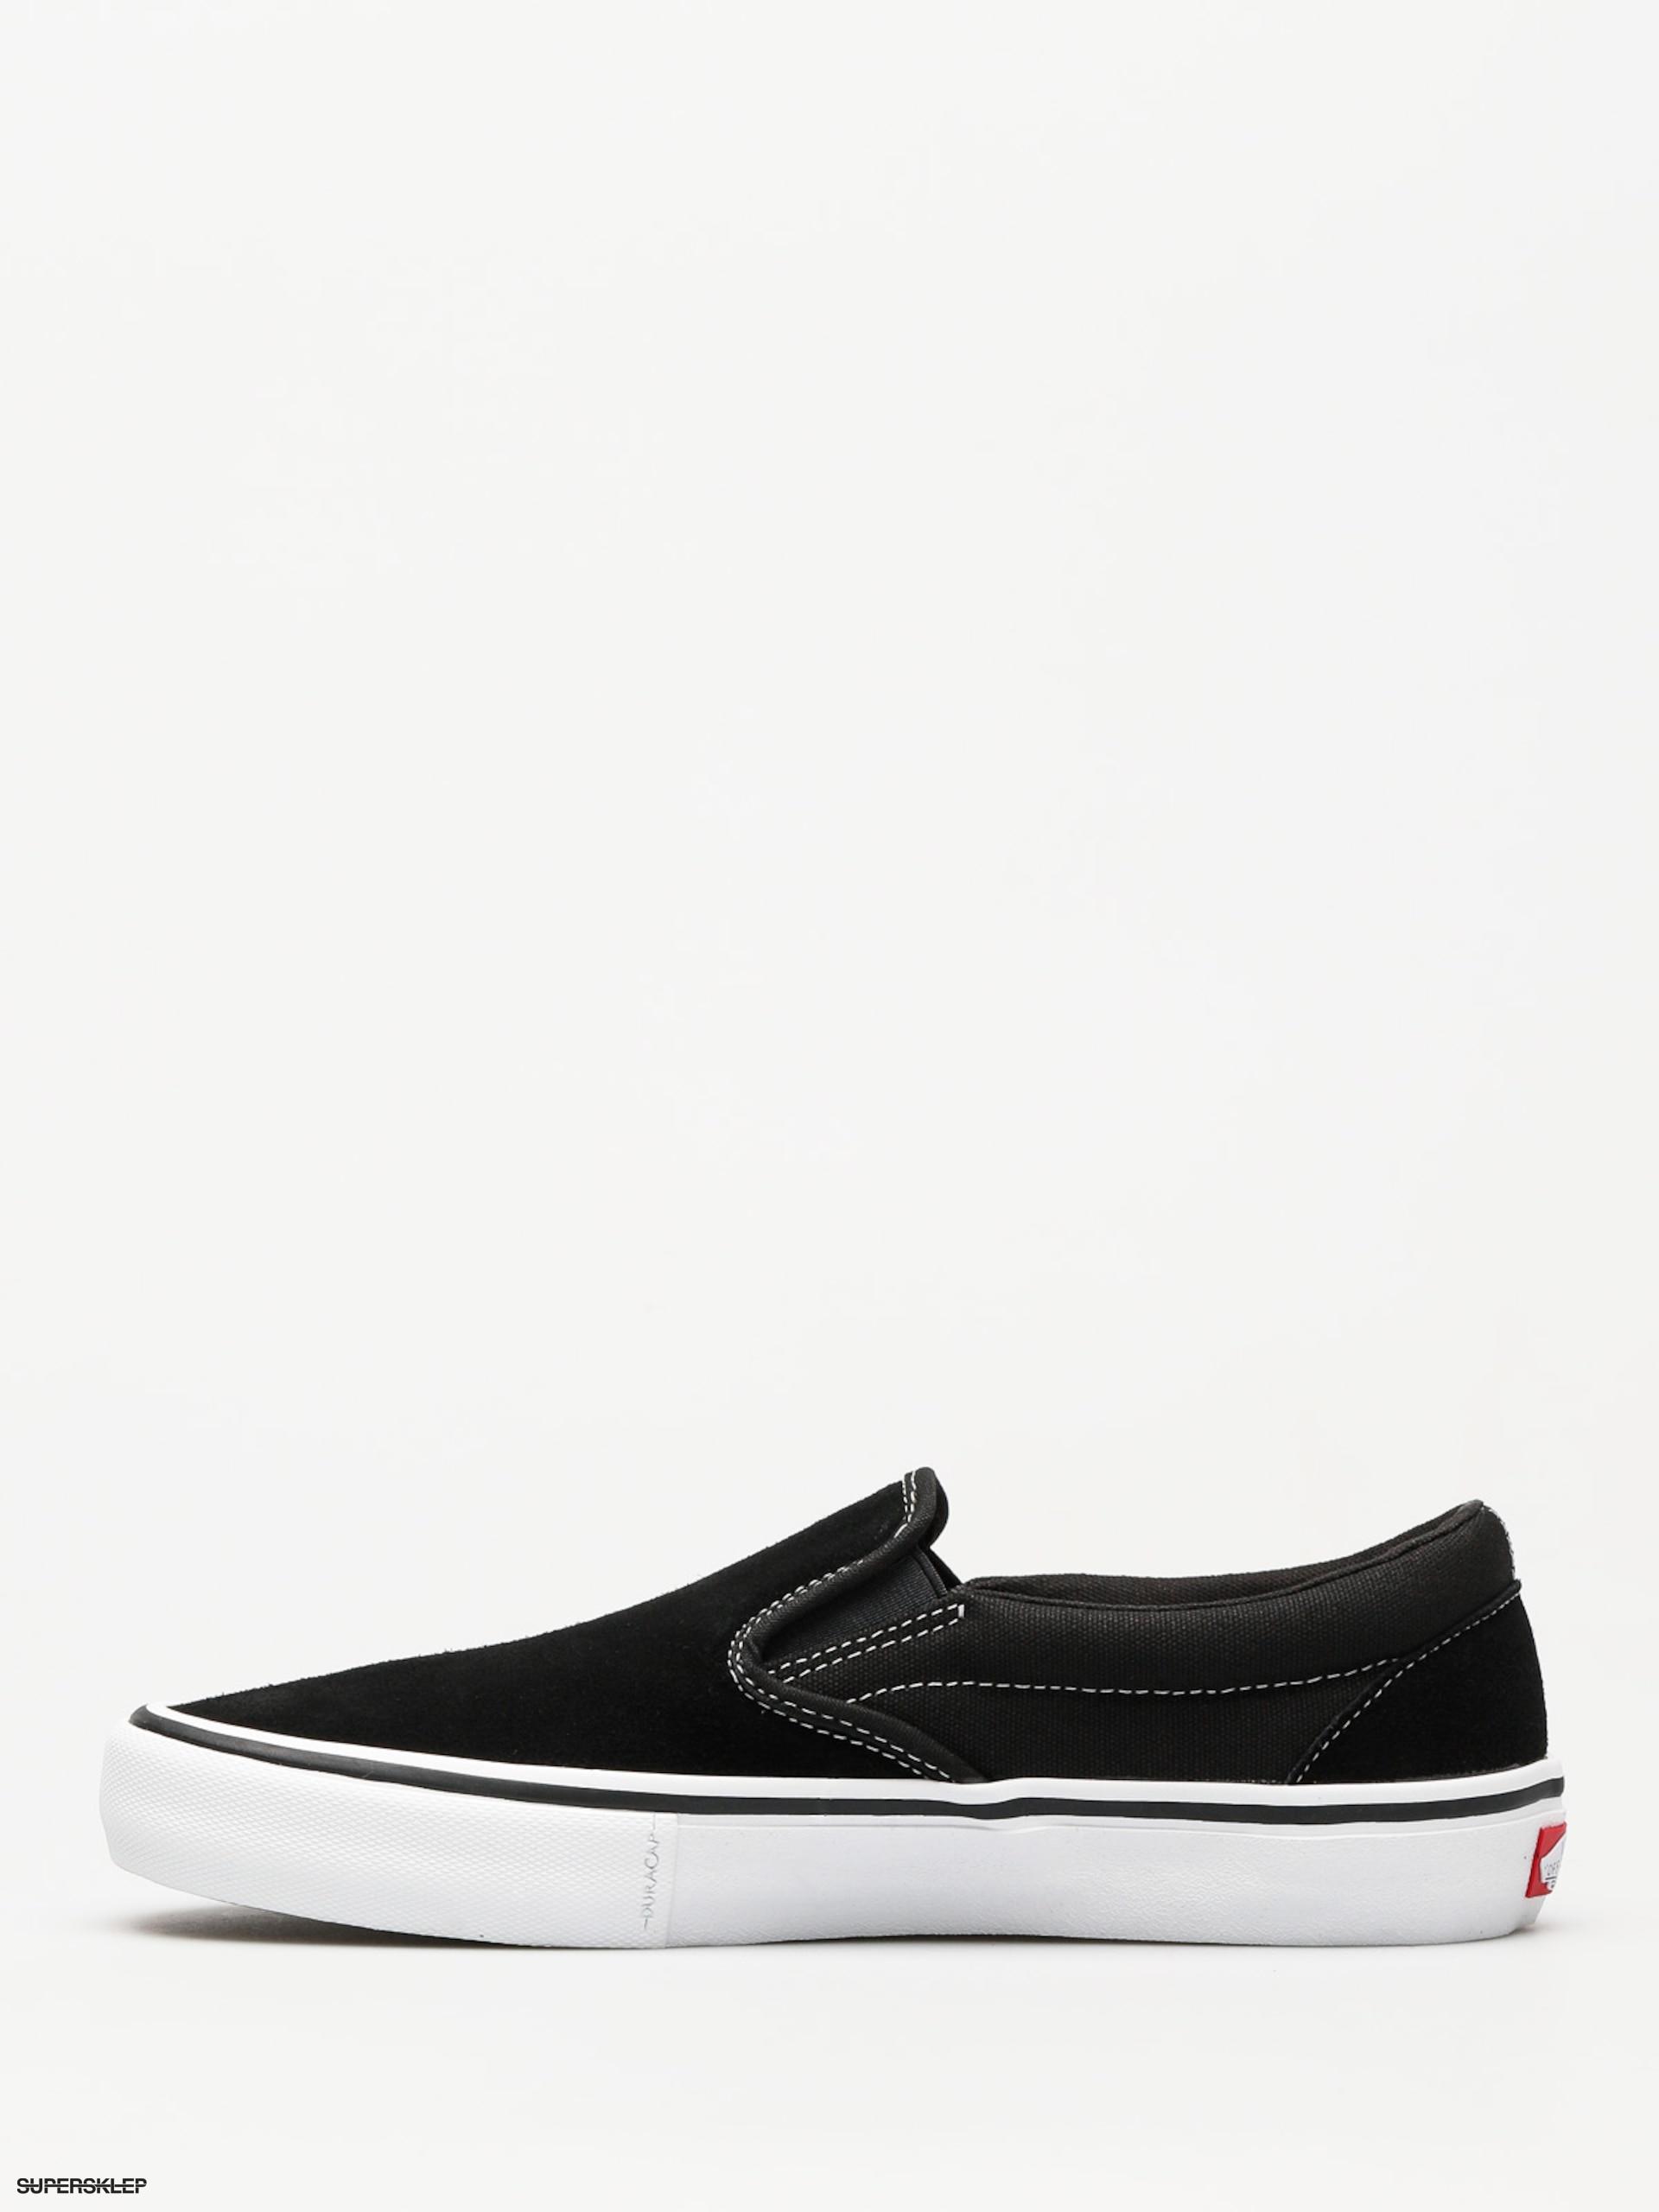 f1ac1e544a Topánky Vans Slip On Pro (black white gum)